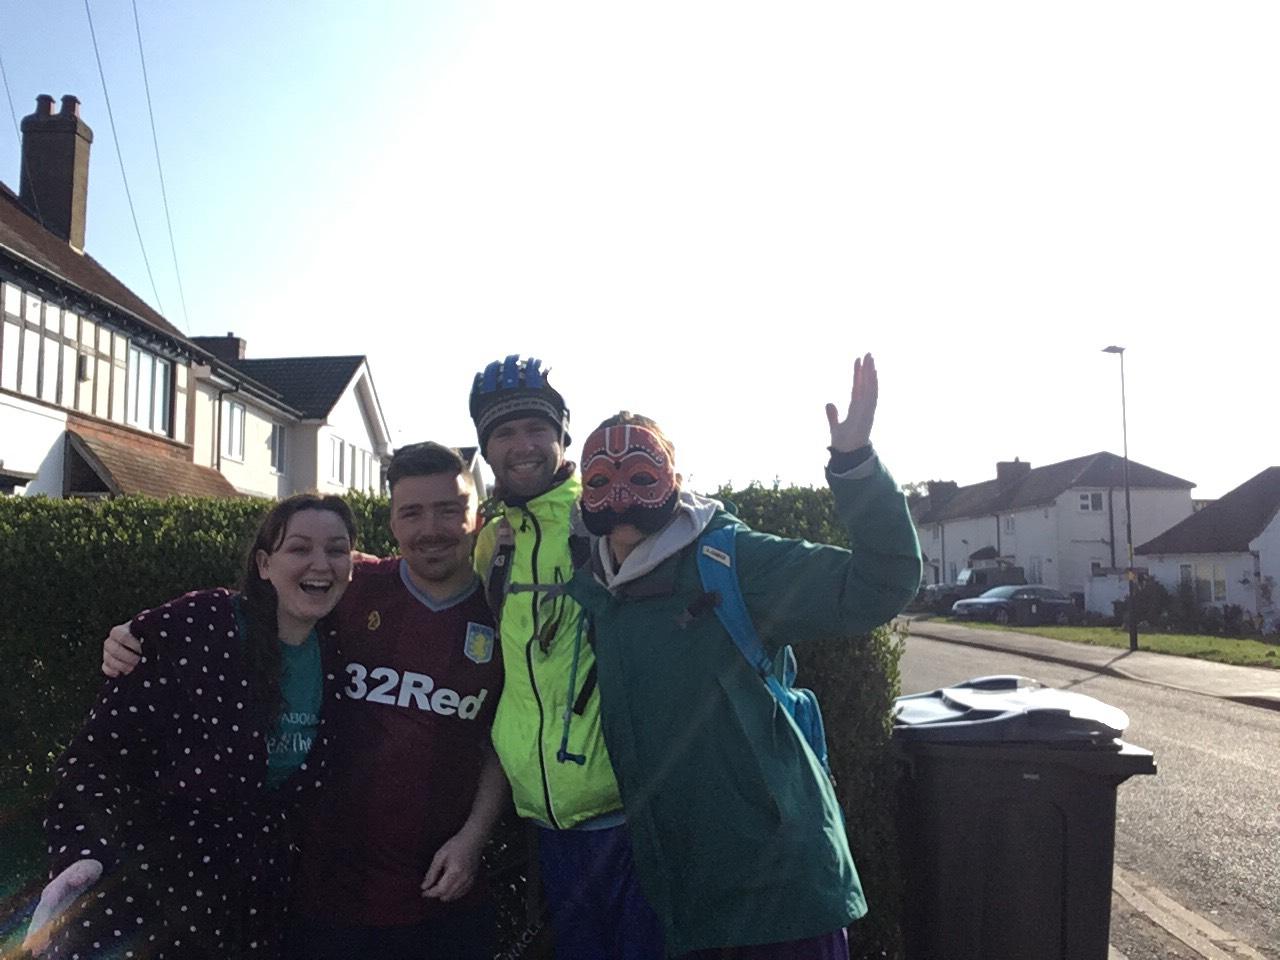 3b-Karna-6 saying good bye before leaving for Oxford.png